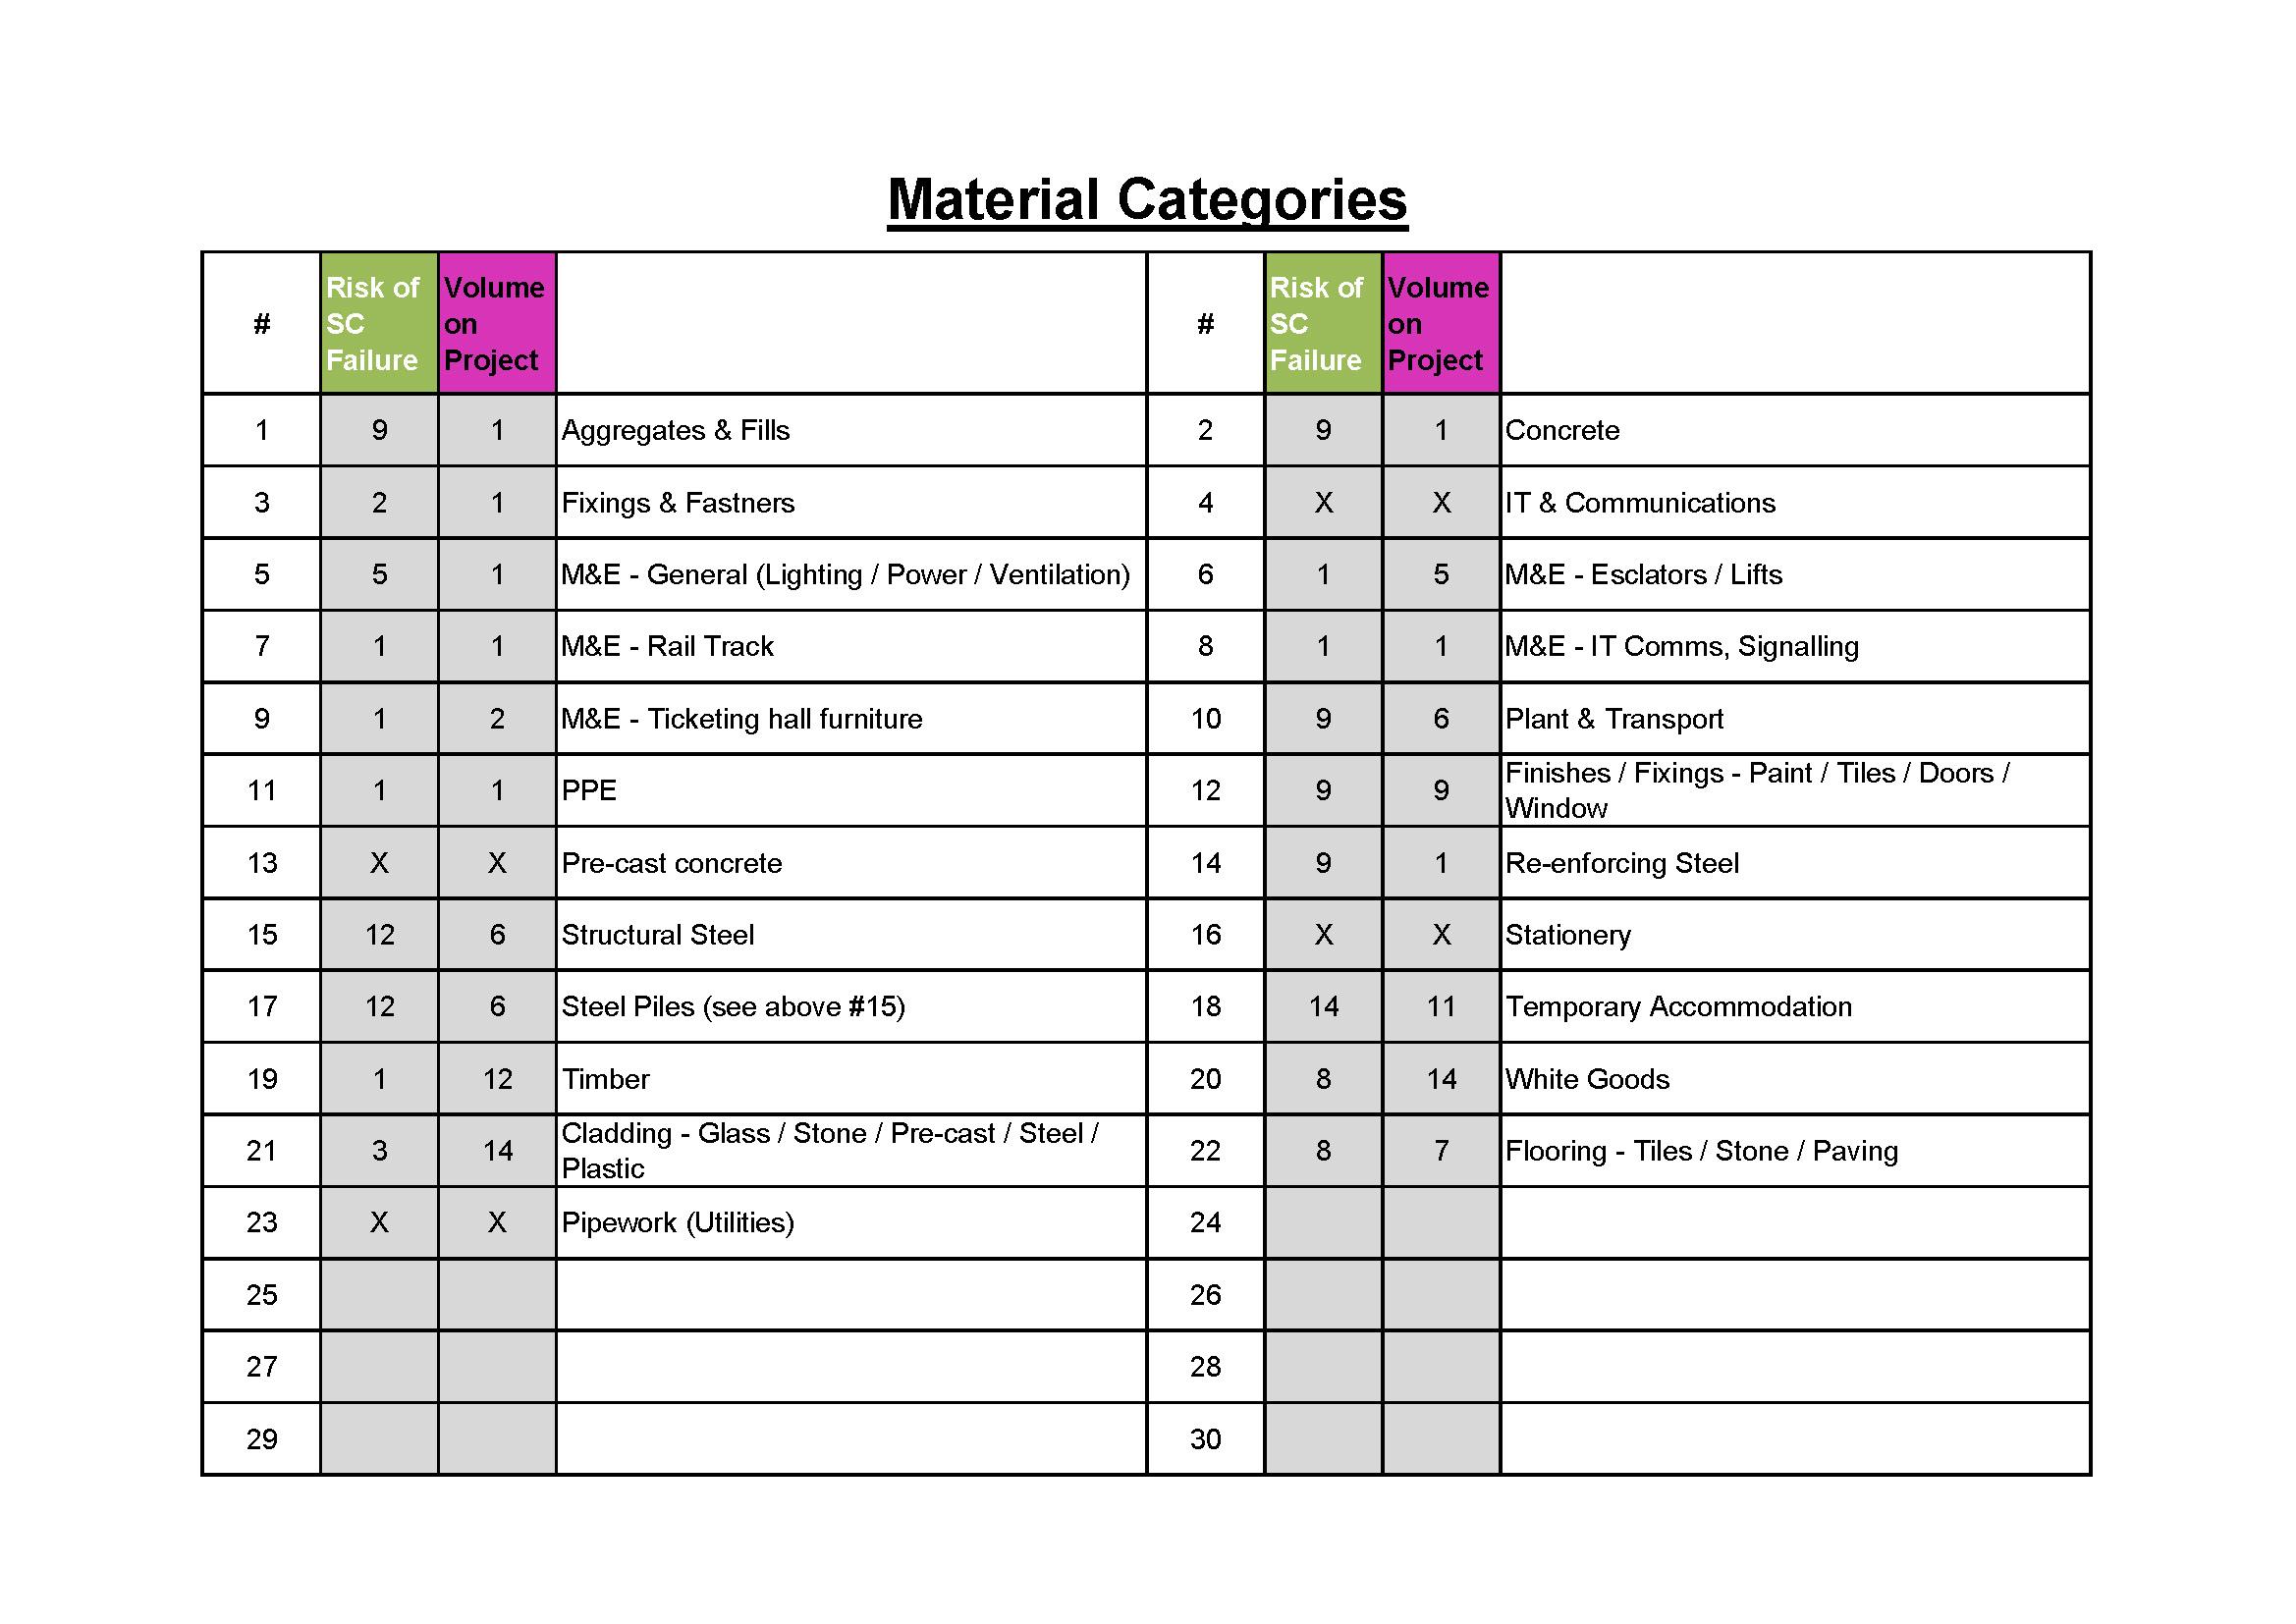 ENV49_Kraljic Matrix_1 Material Categories.jpg